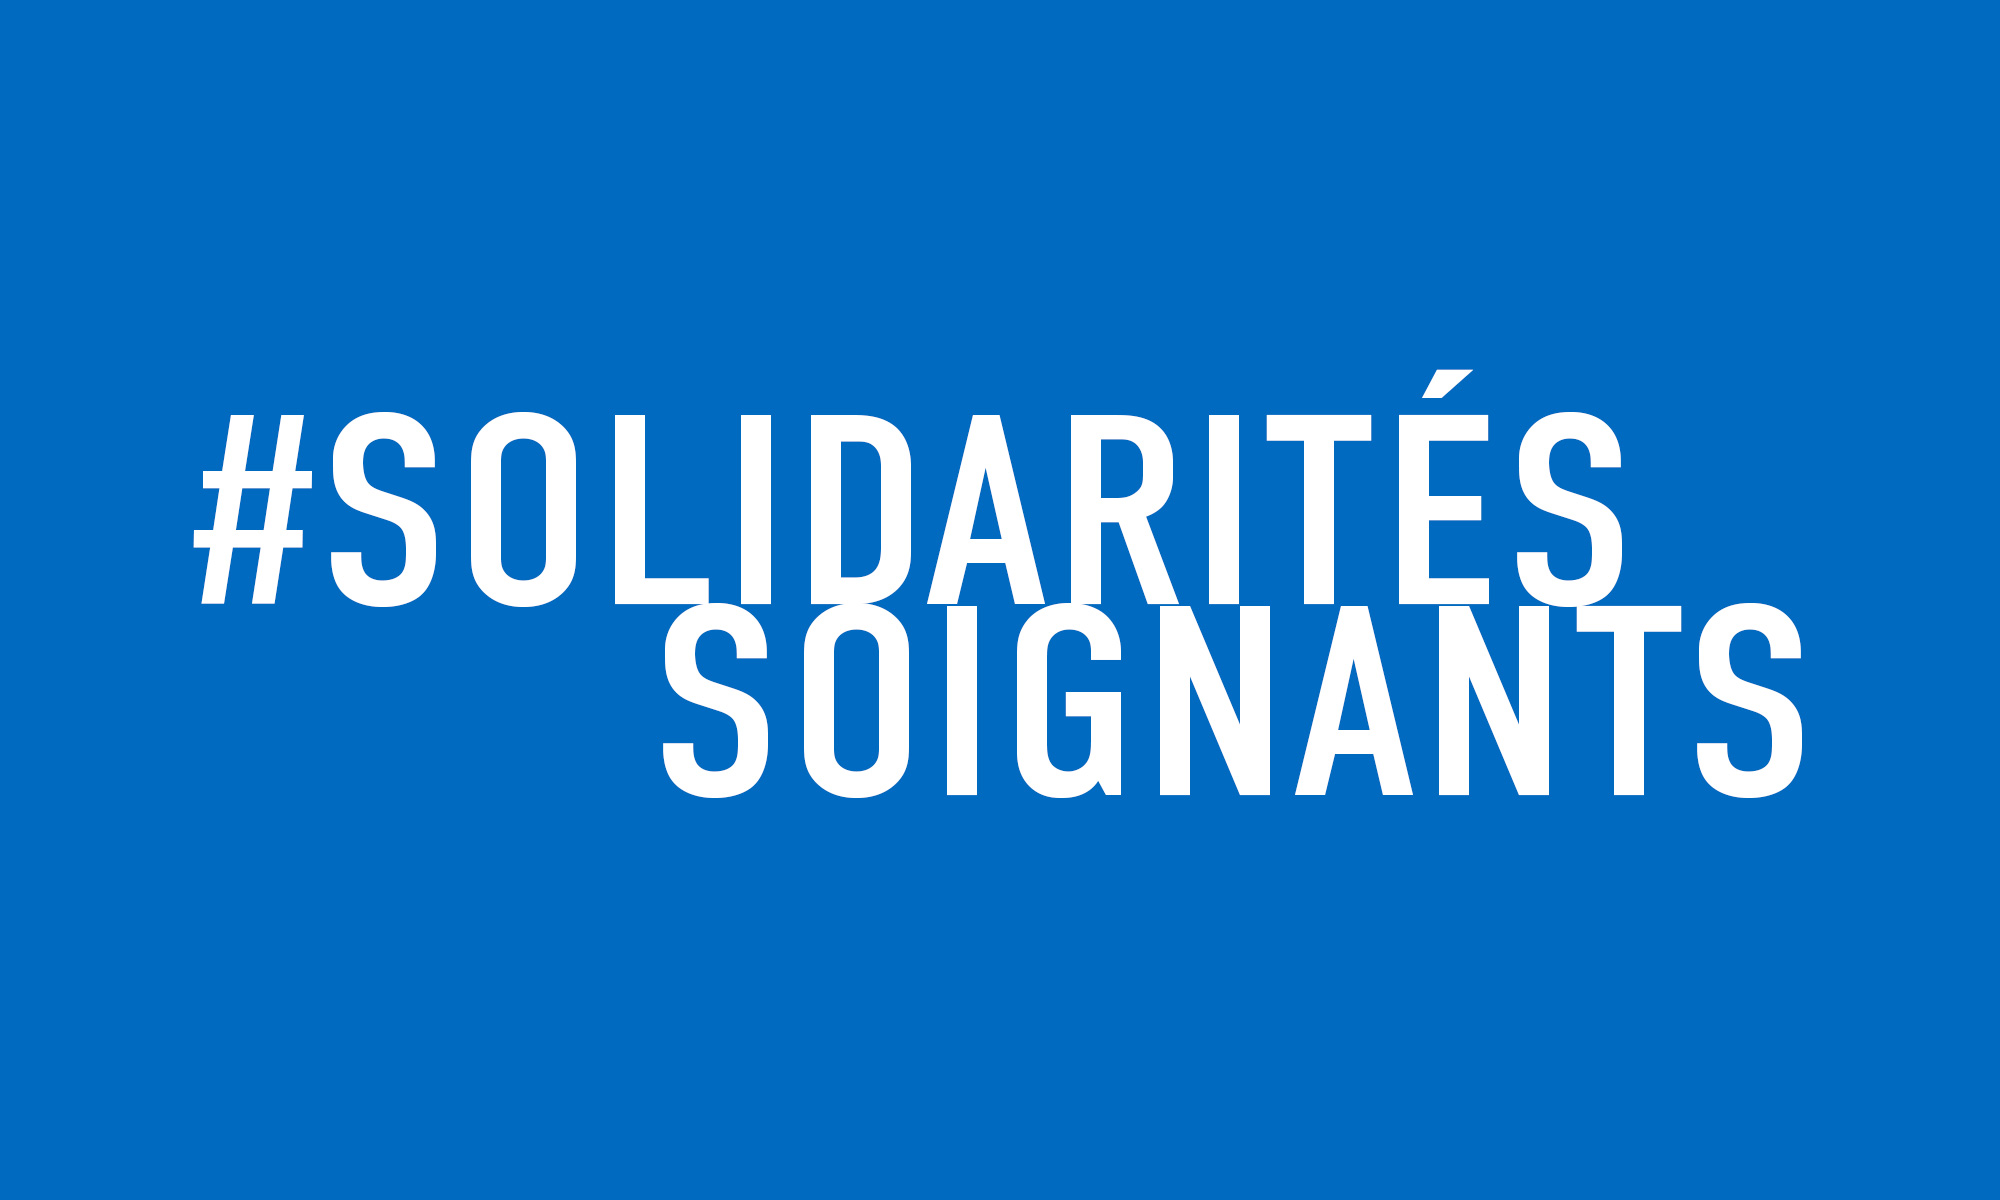 #SOLIDARITE</br>SOIGNANTS